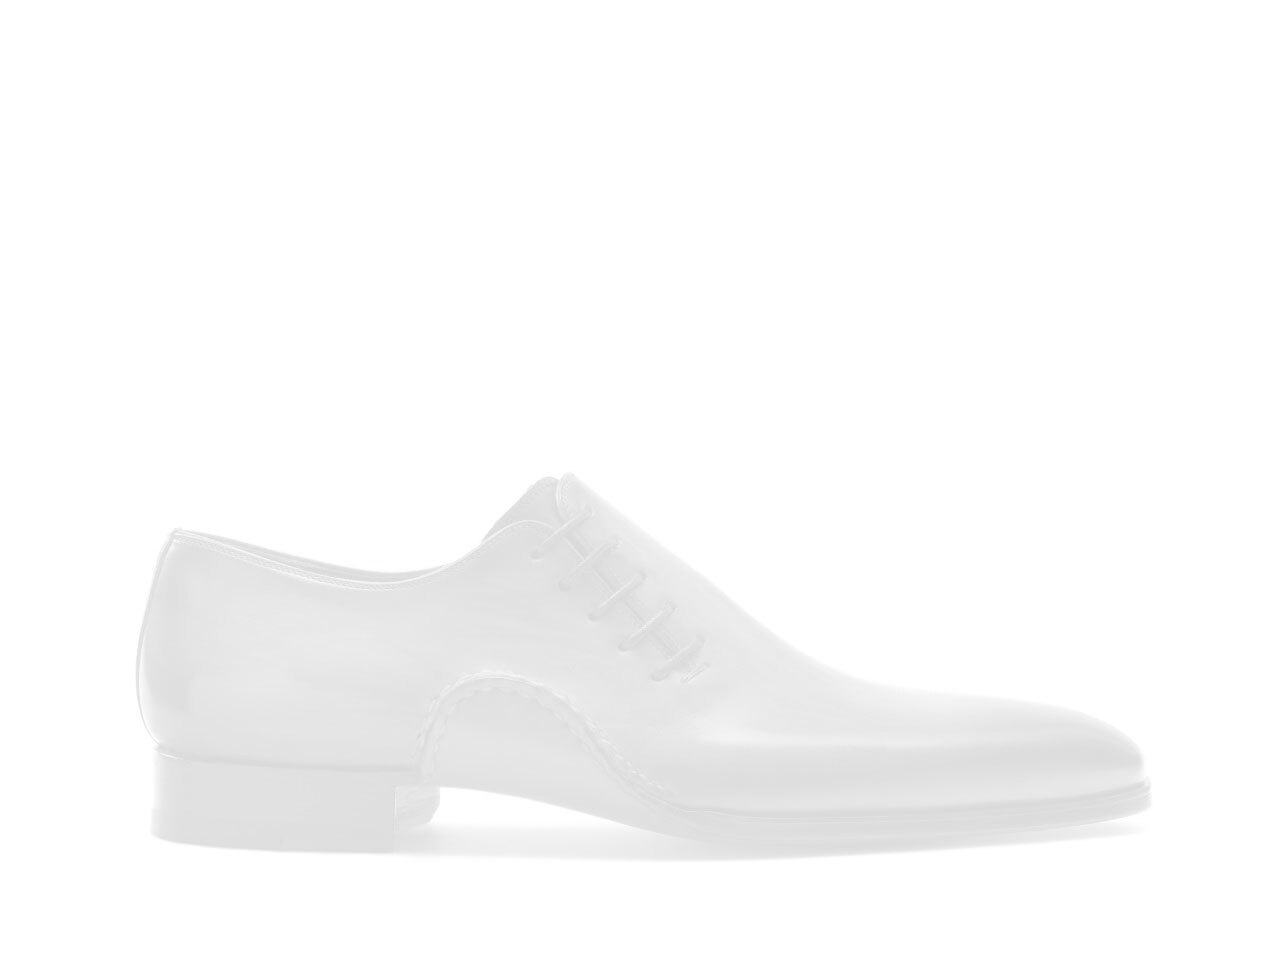 Sole of the Magnanni Orbada Cognac Men's Sneakers